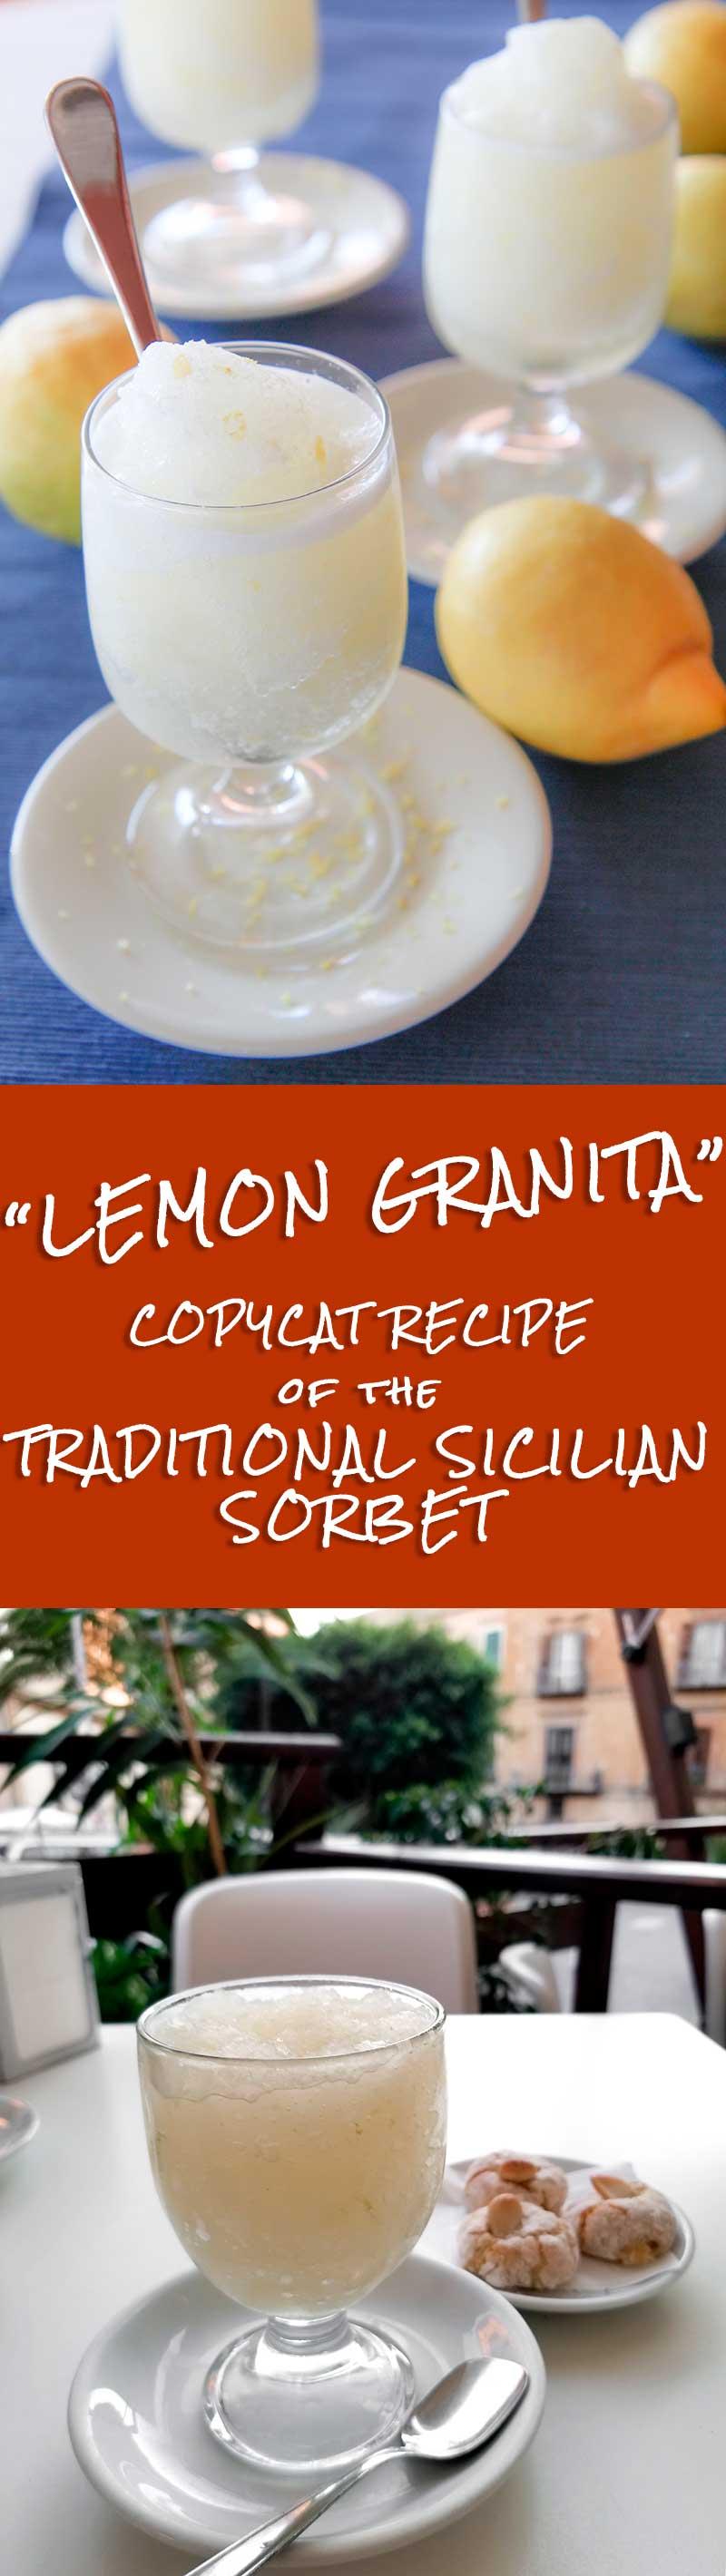 LEMON GRANITA - traditional Sicilian sorbet recipe